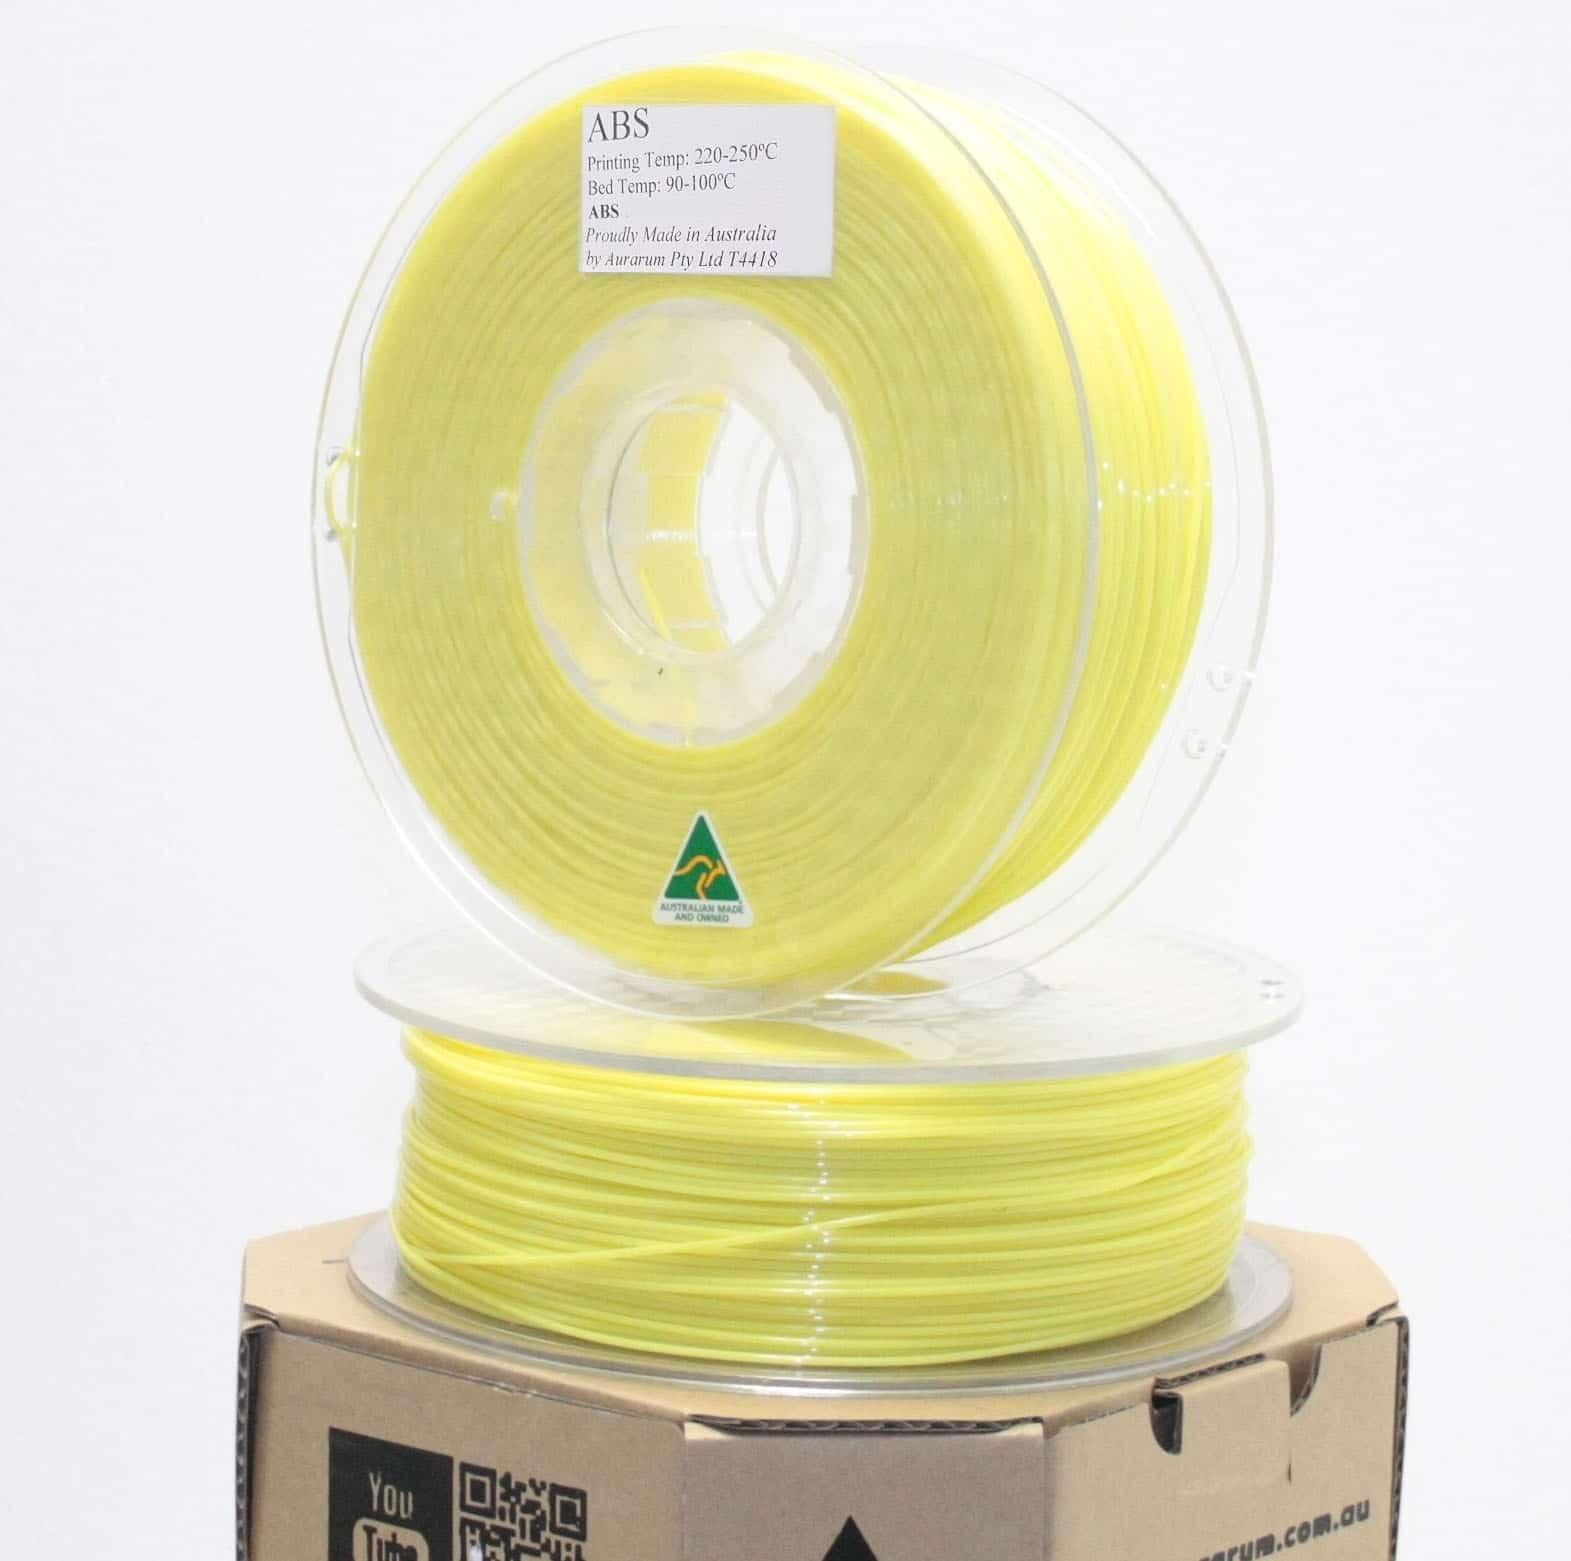 Aurarum ABS 3D Printer Filament - Safety Yellow 2.85mm 1Kg